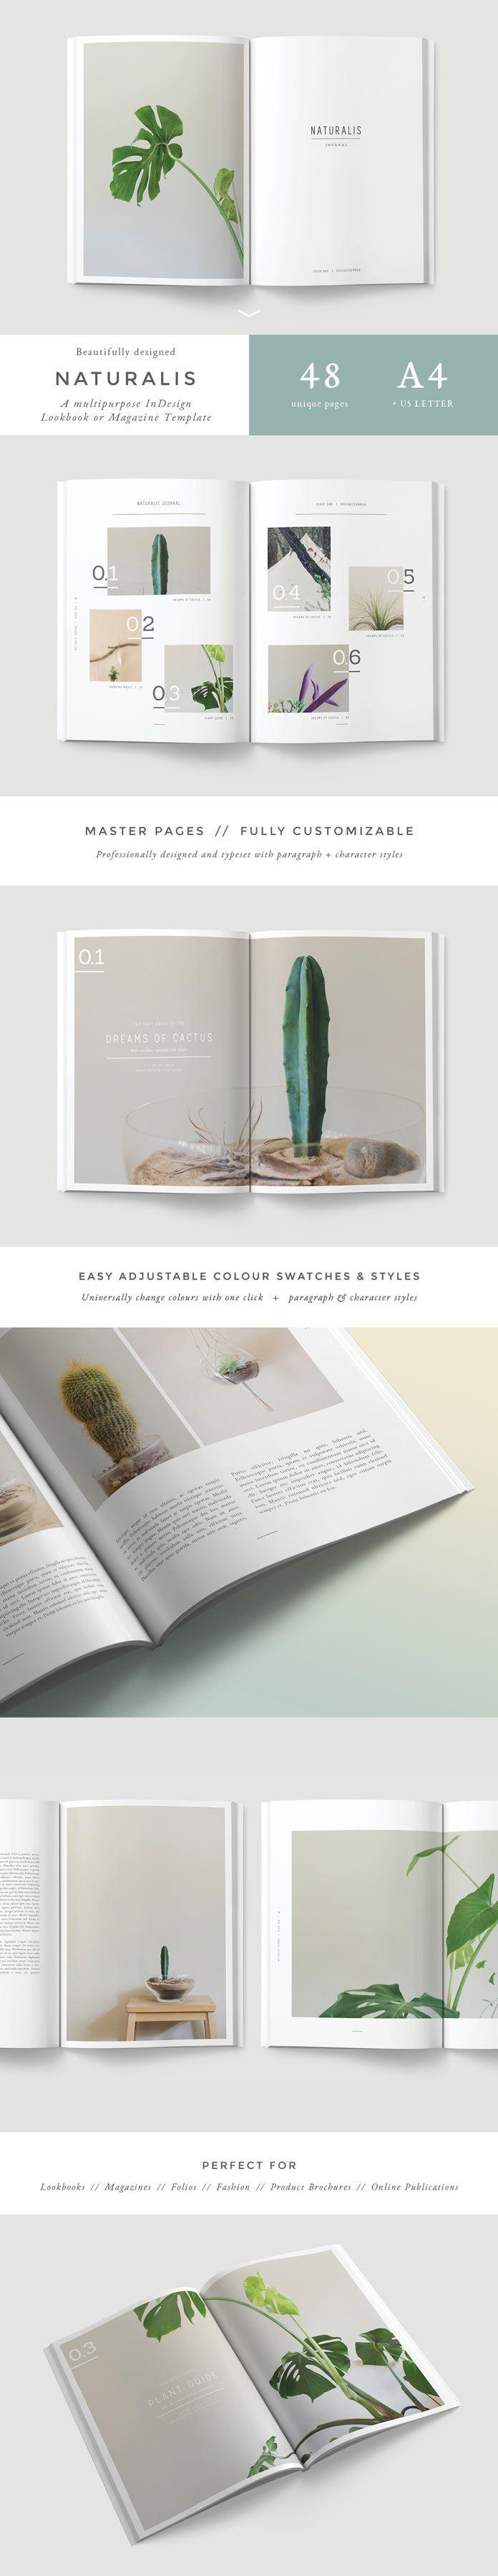 A multipurpose Adobe InDesign lookbook and magazine template.